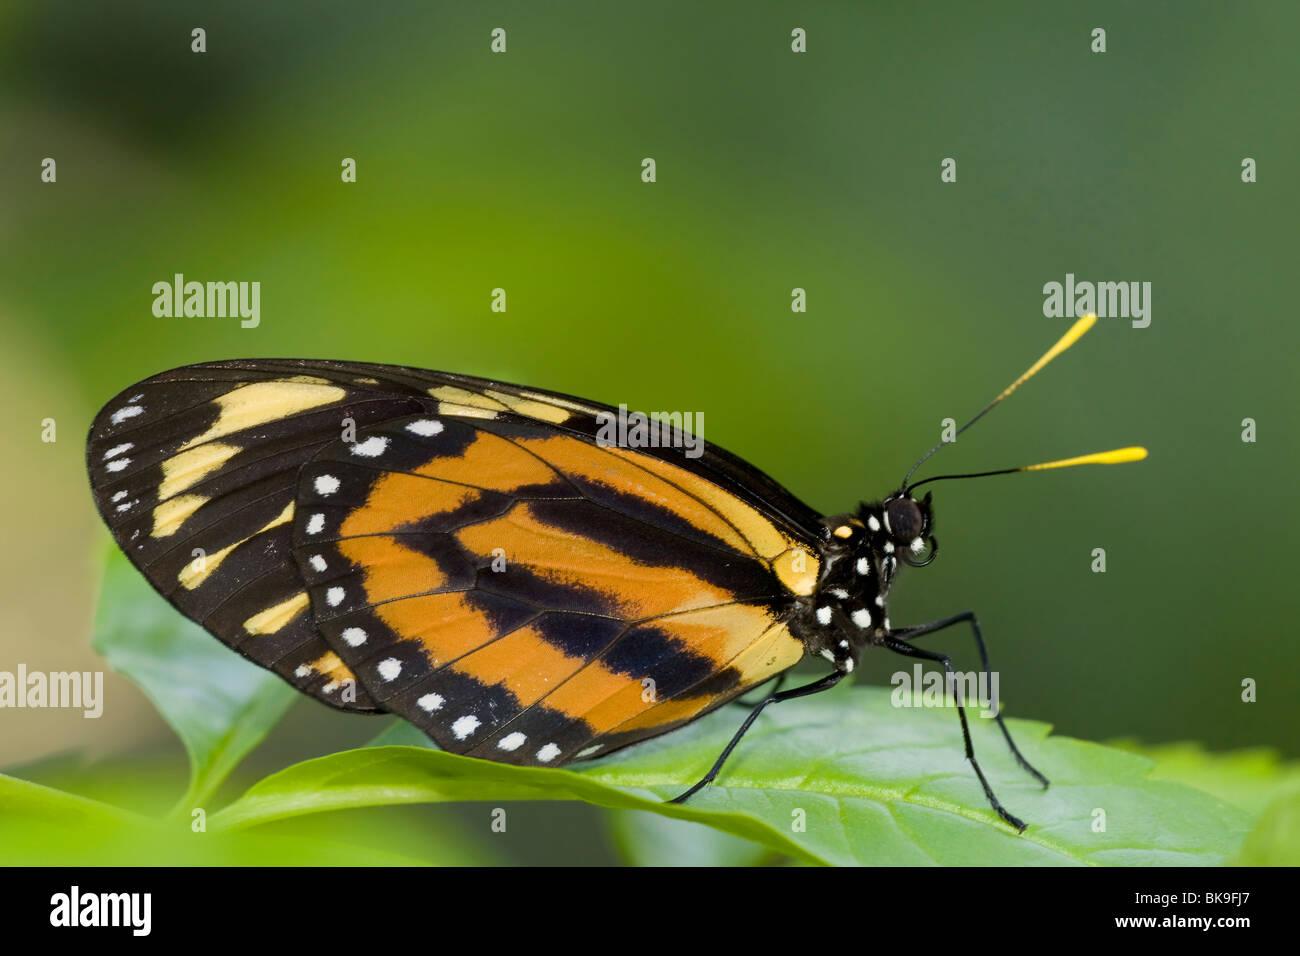 Tiger Mimik-Königin Schmetterling (Lycorea Cleobaea) hocken auf einem Blatt Stockbild